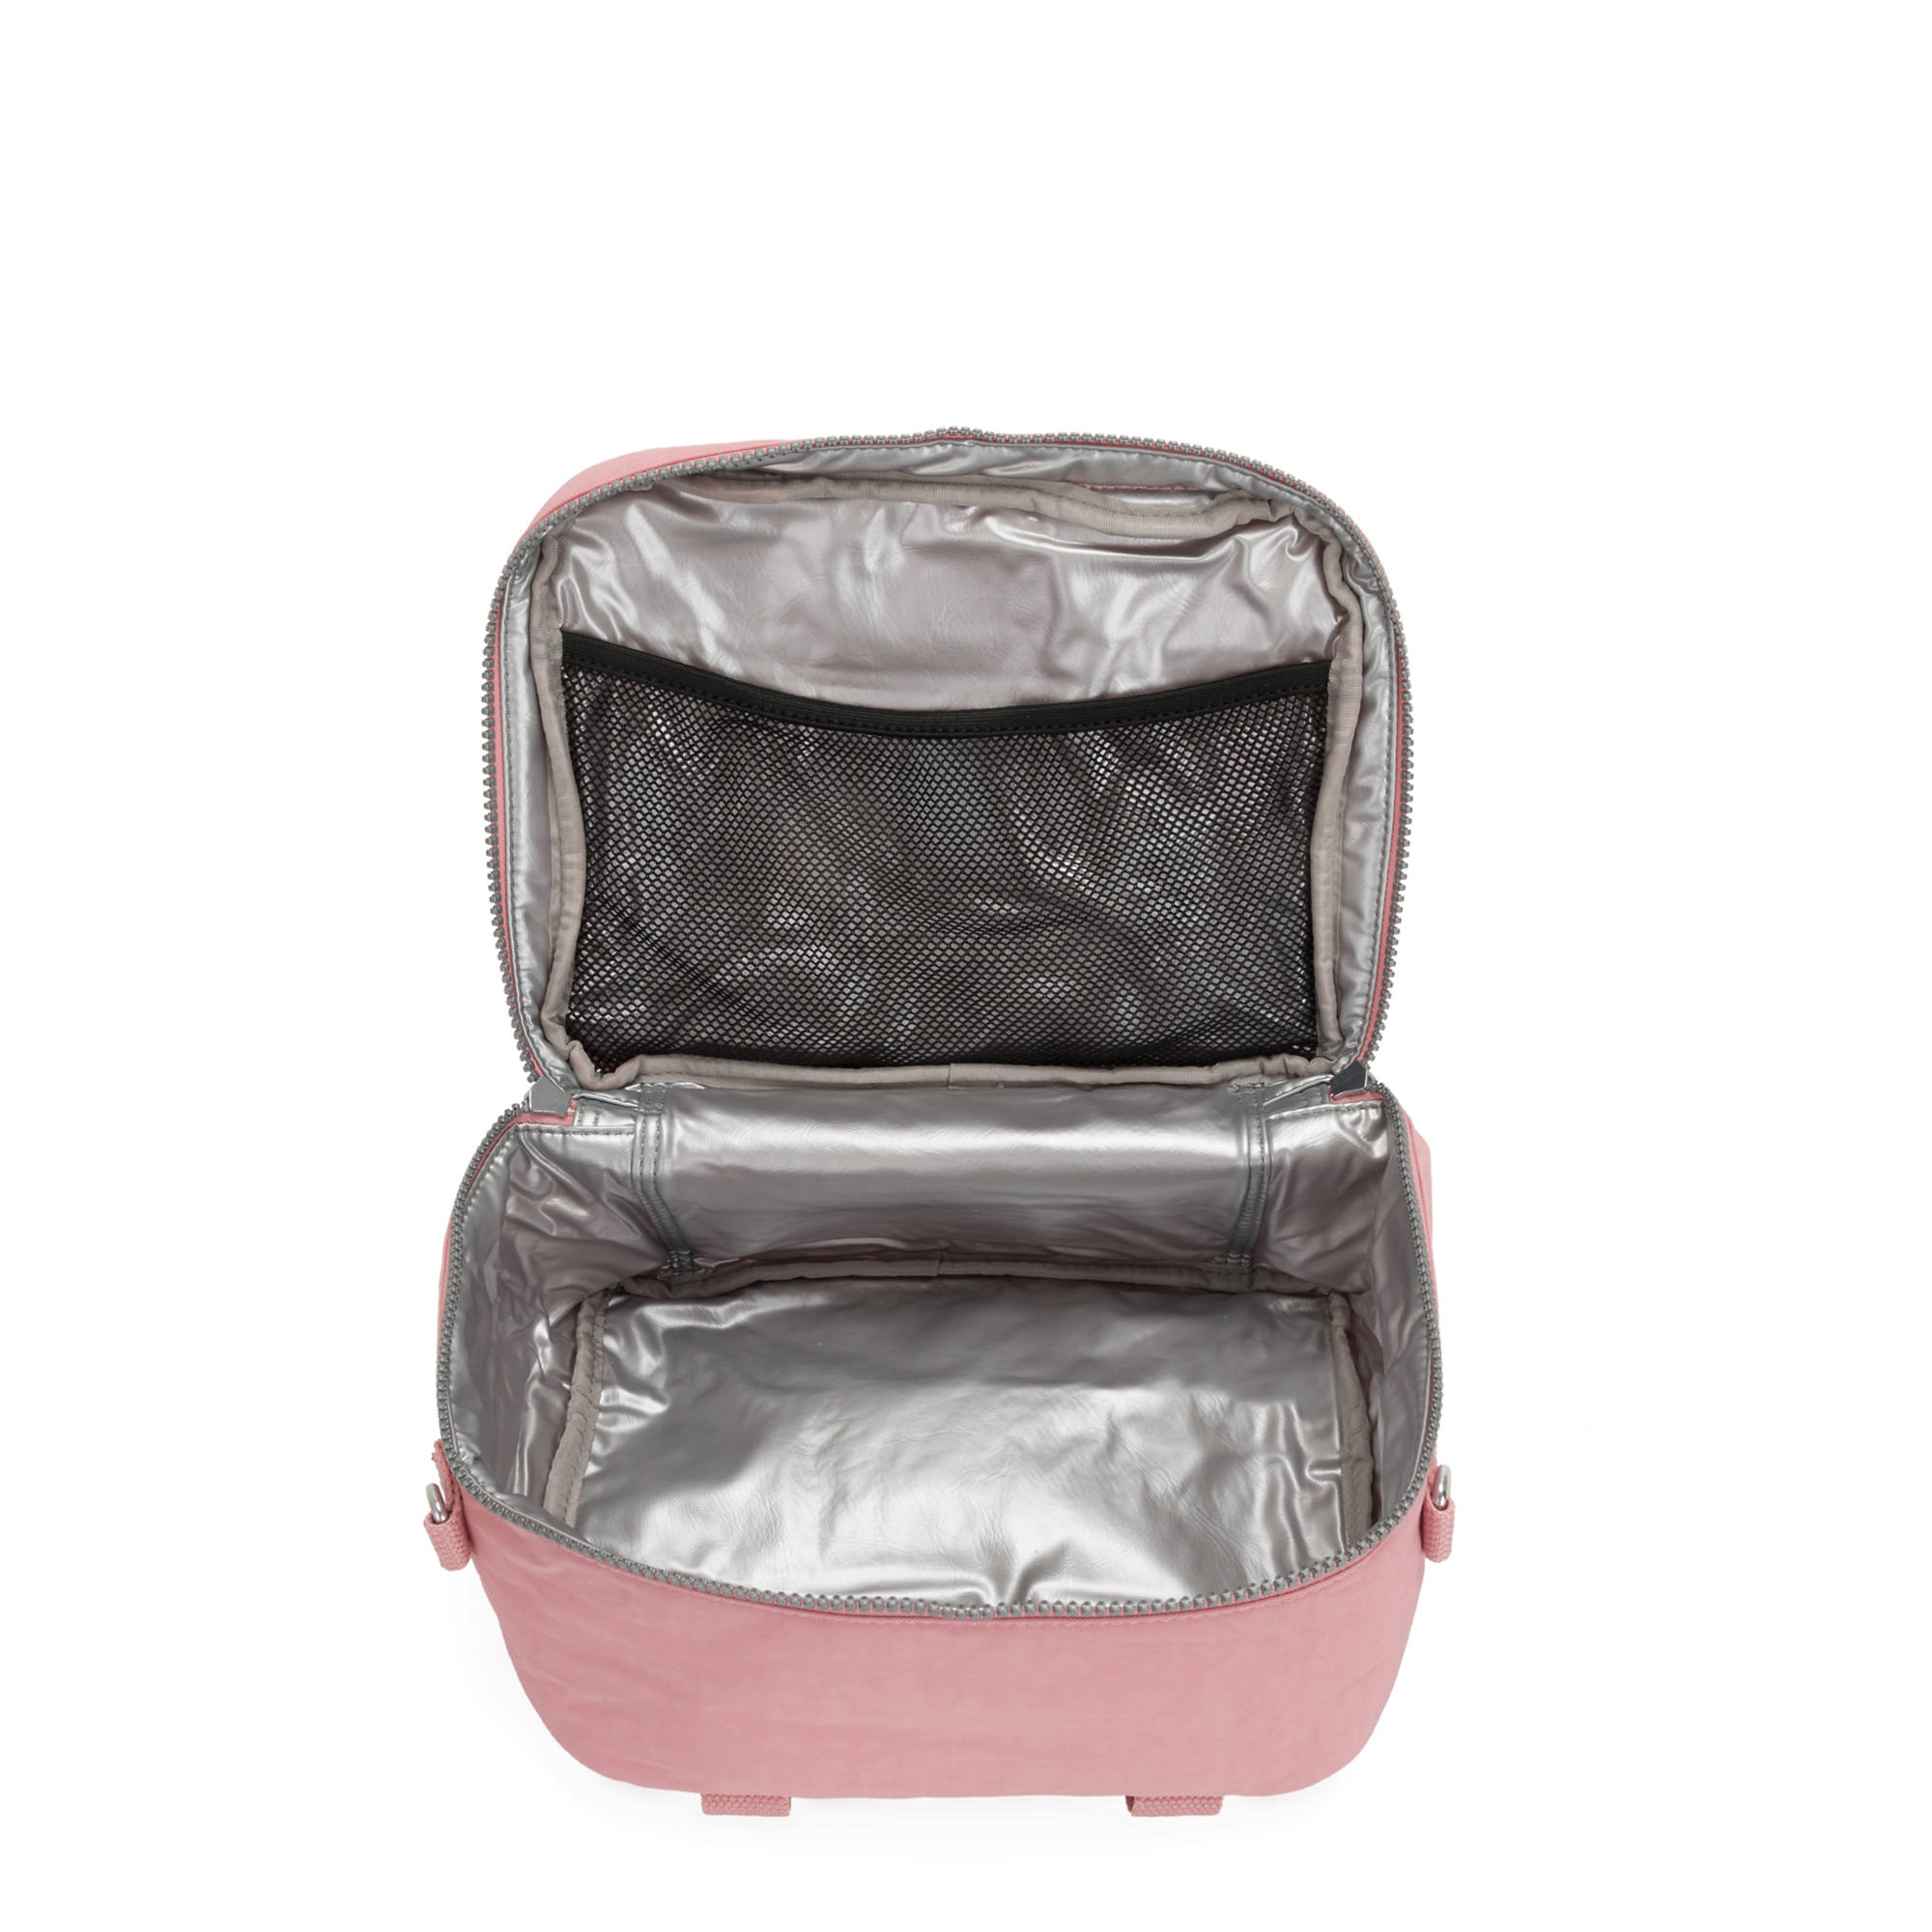 5097585f1bb0 Miyo Lunch Bag